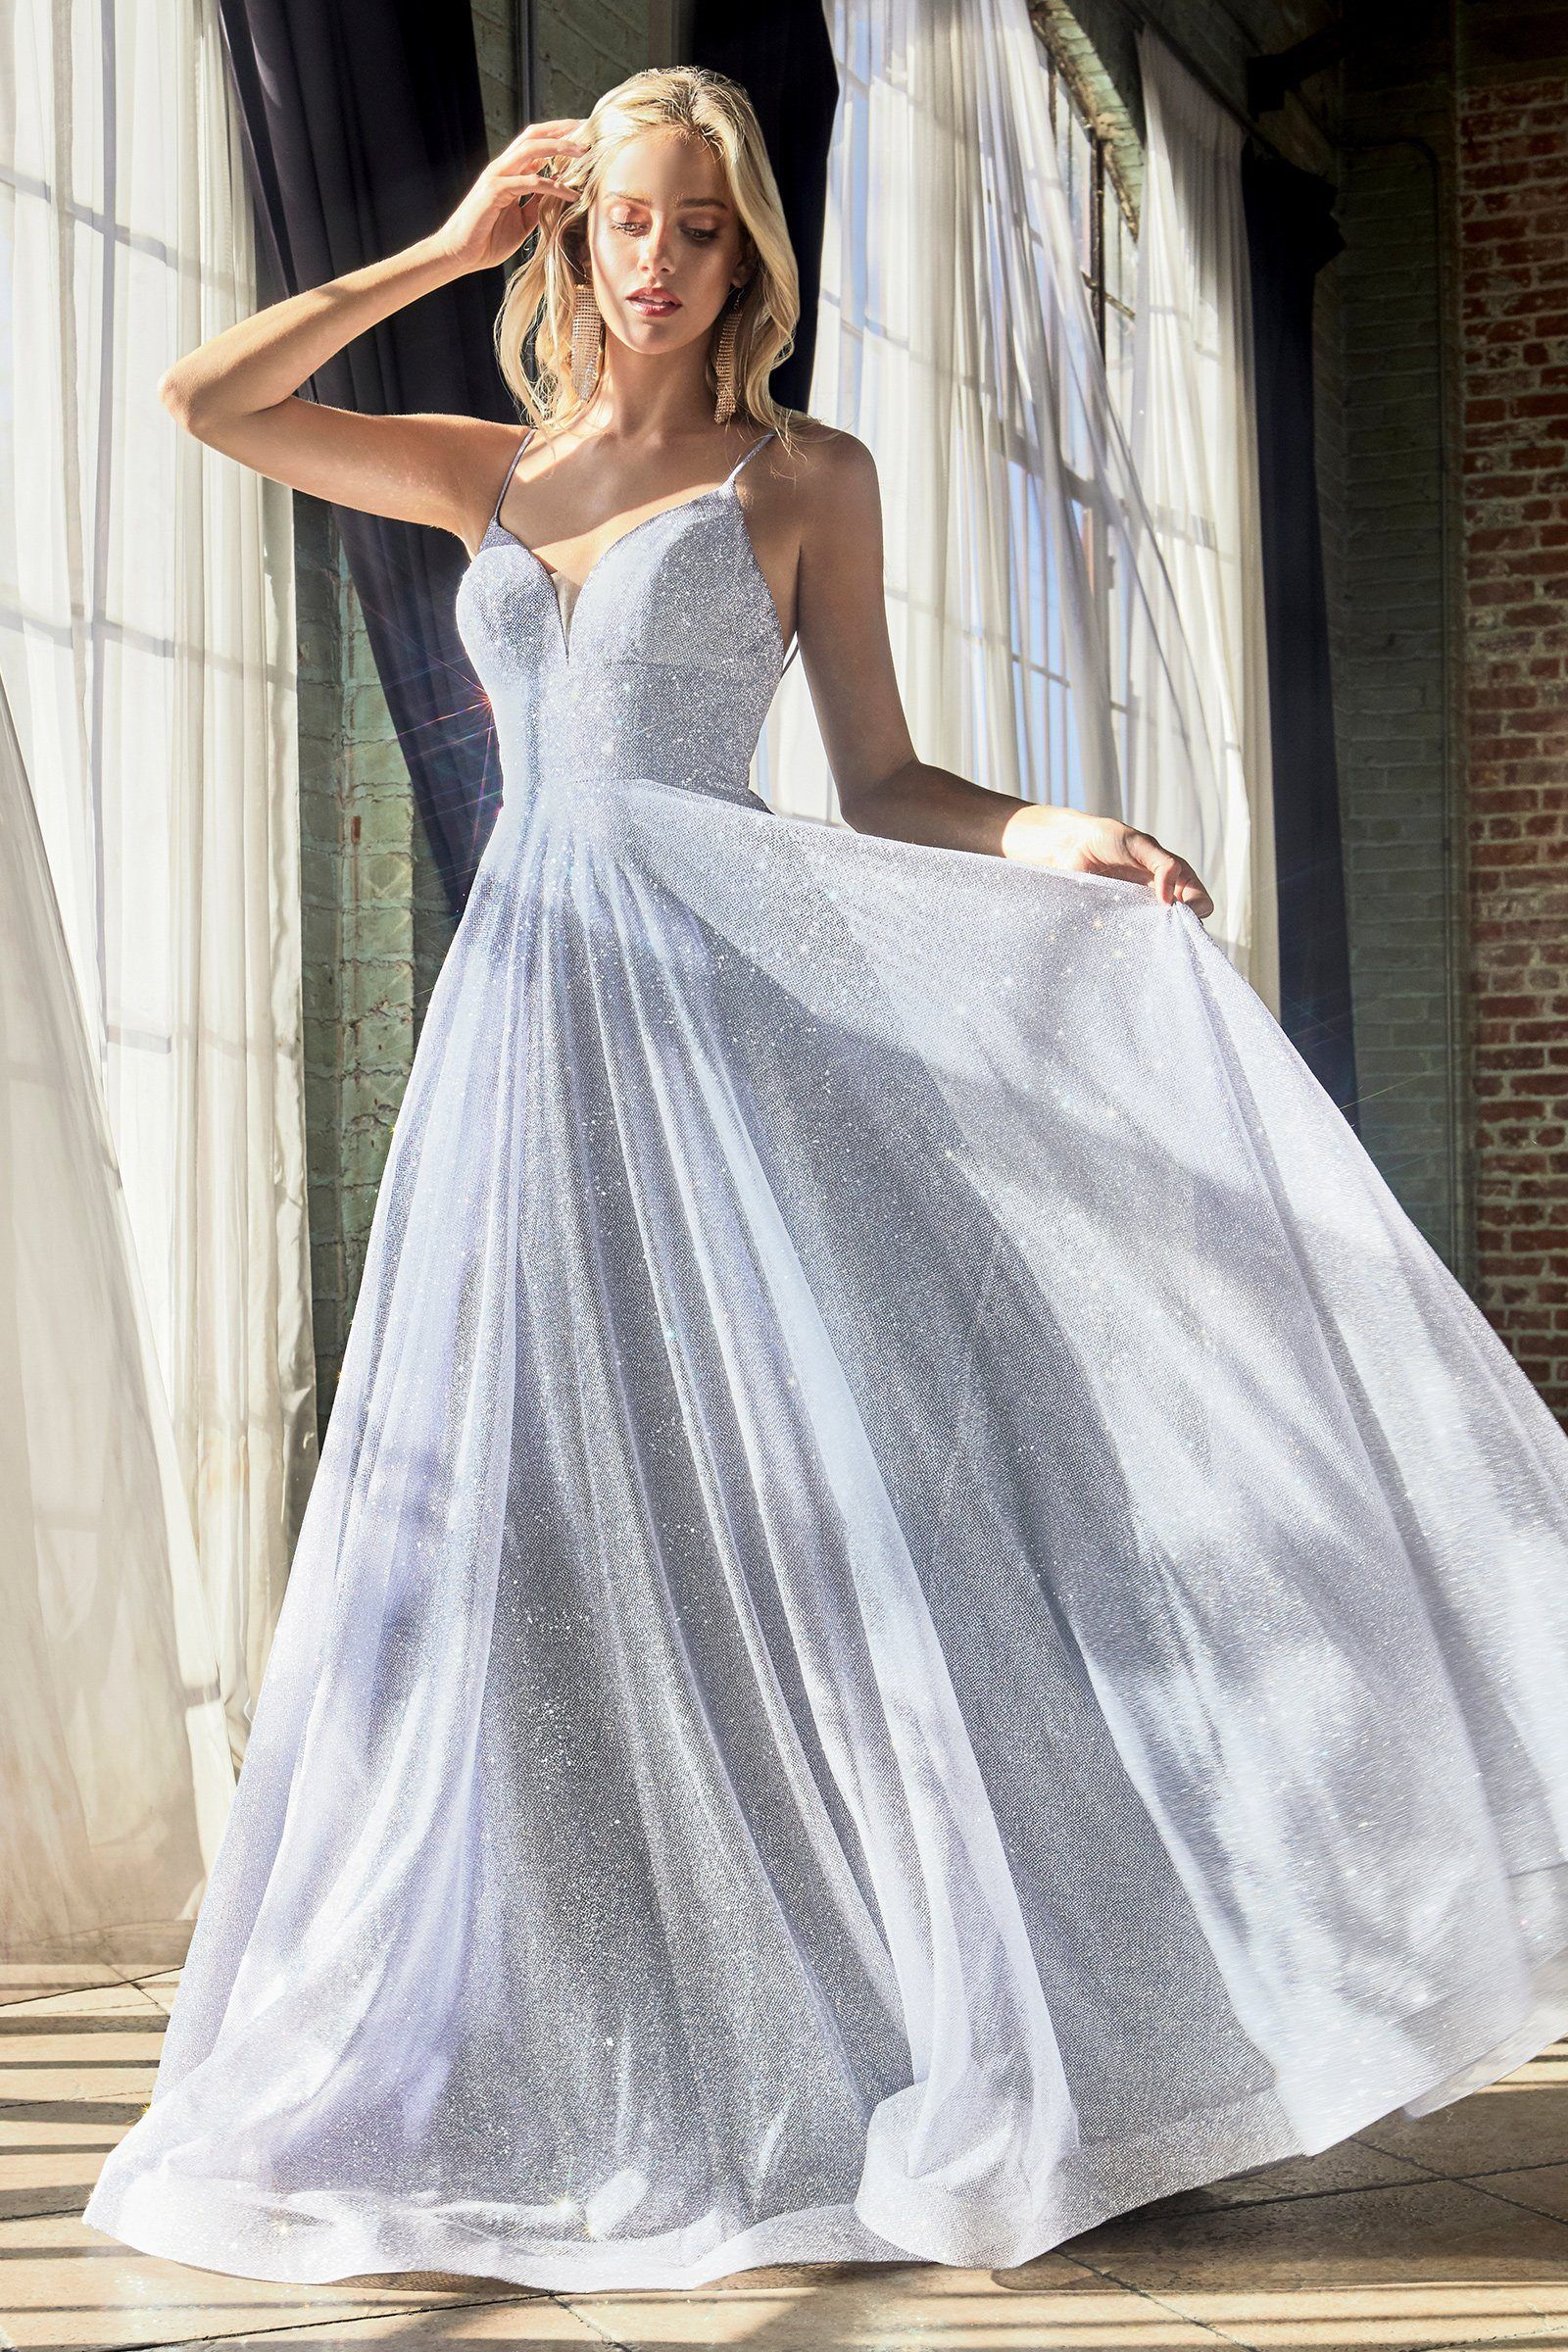 Long Sleeveless Glitter Dress By Cinderella Divine Cd205 Stunning Prom Dresses Cute Prom Dresses Prom Dresses [ 2400 x 1600 Pixel ]